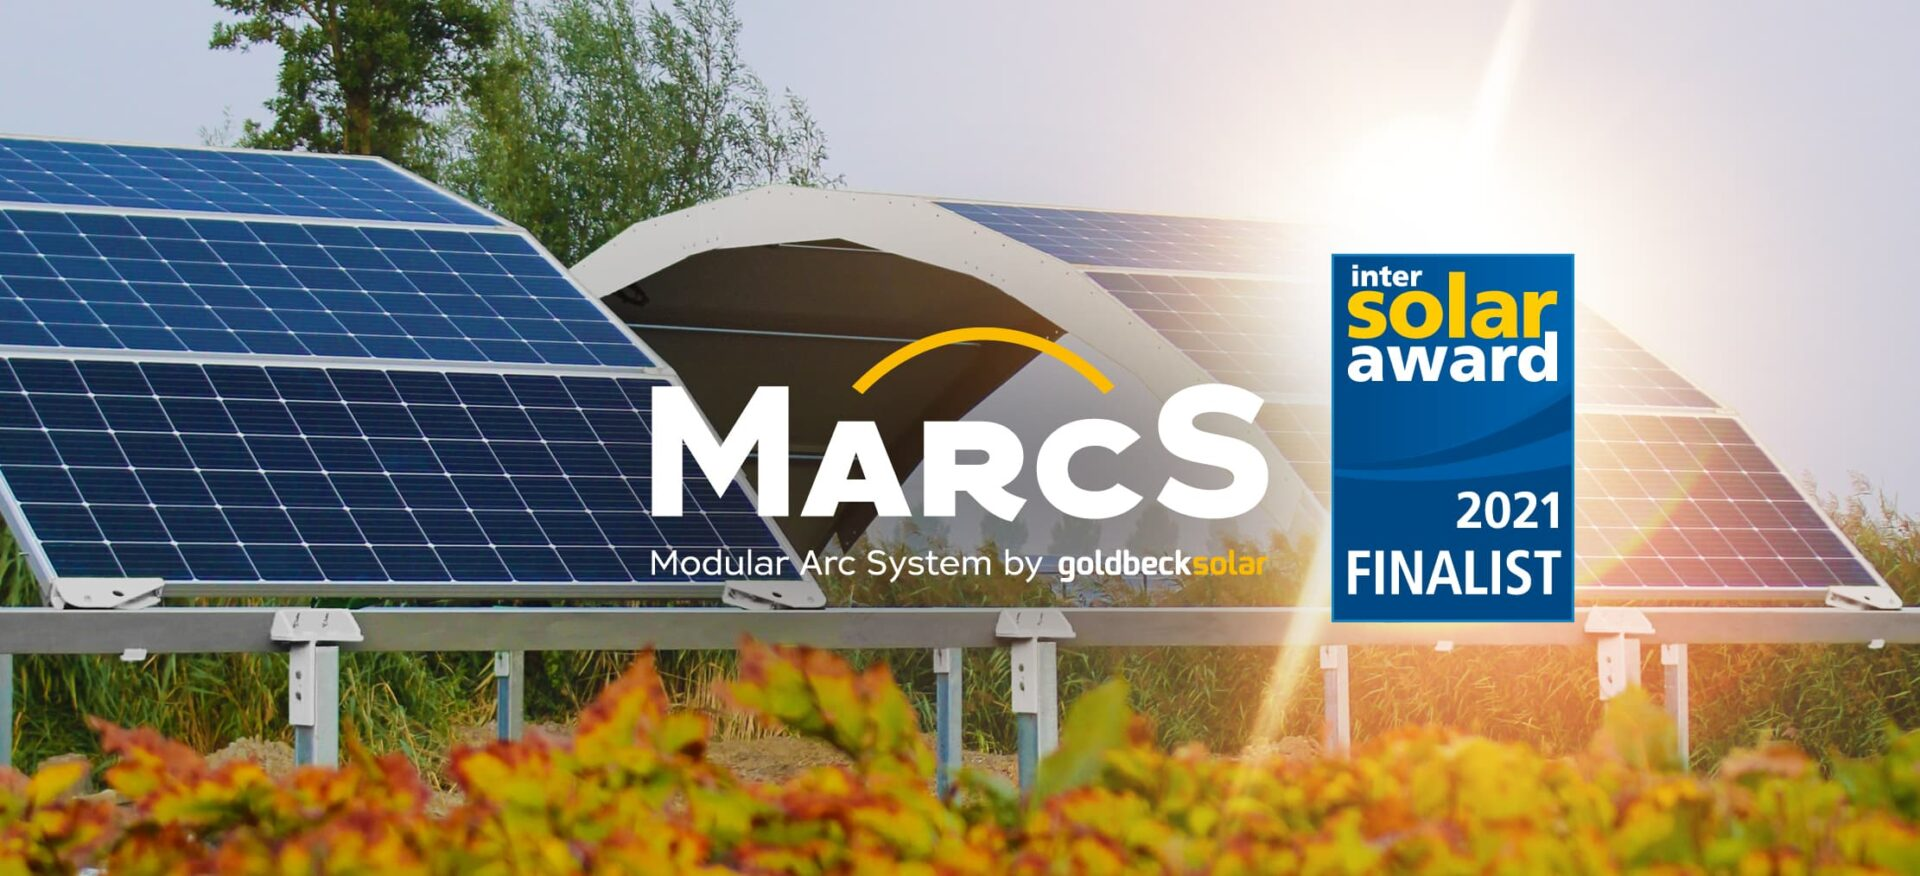 Mit dem Projekt MarcS ist GOLDBECK SOLAR im Finale der Intersolar Awards